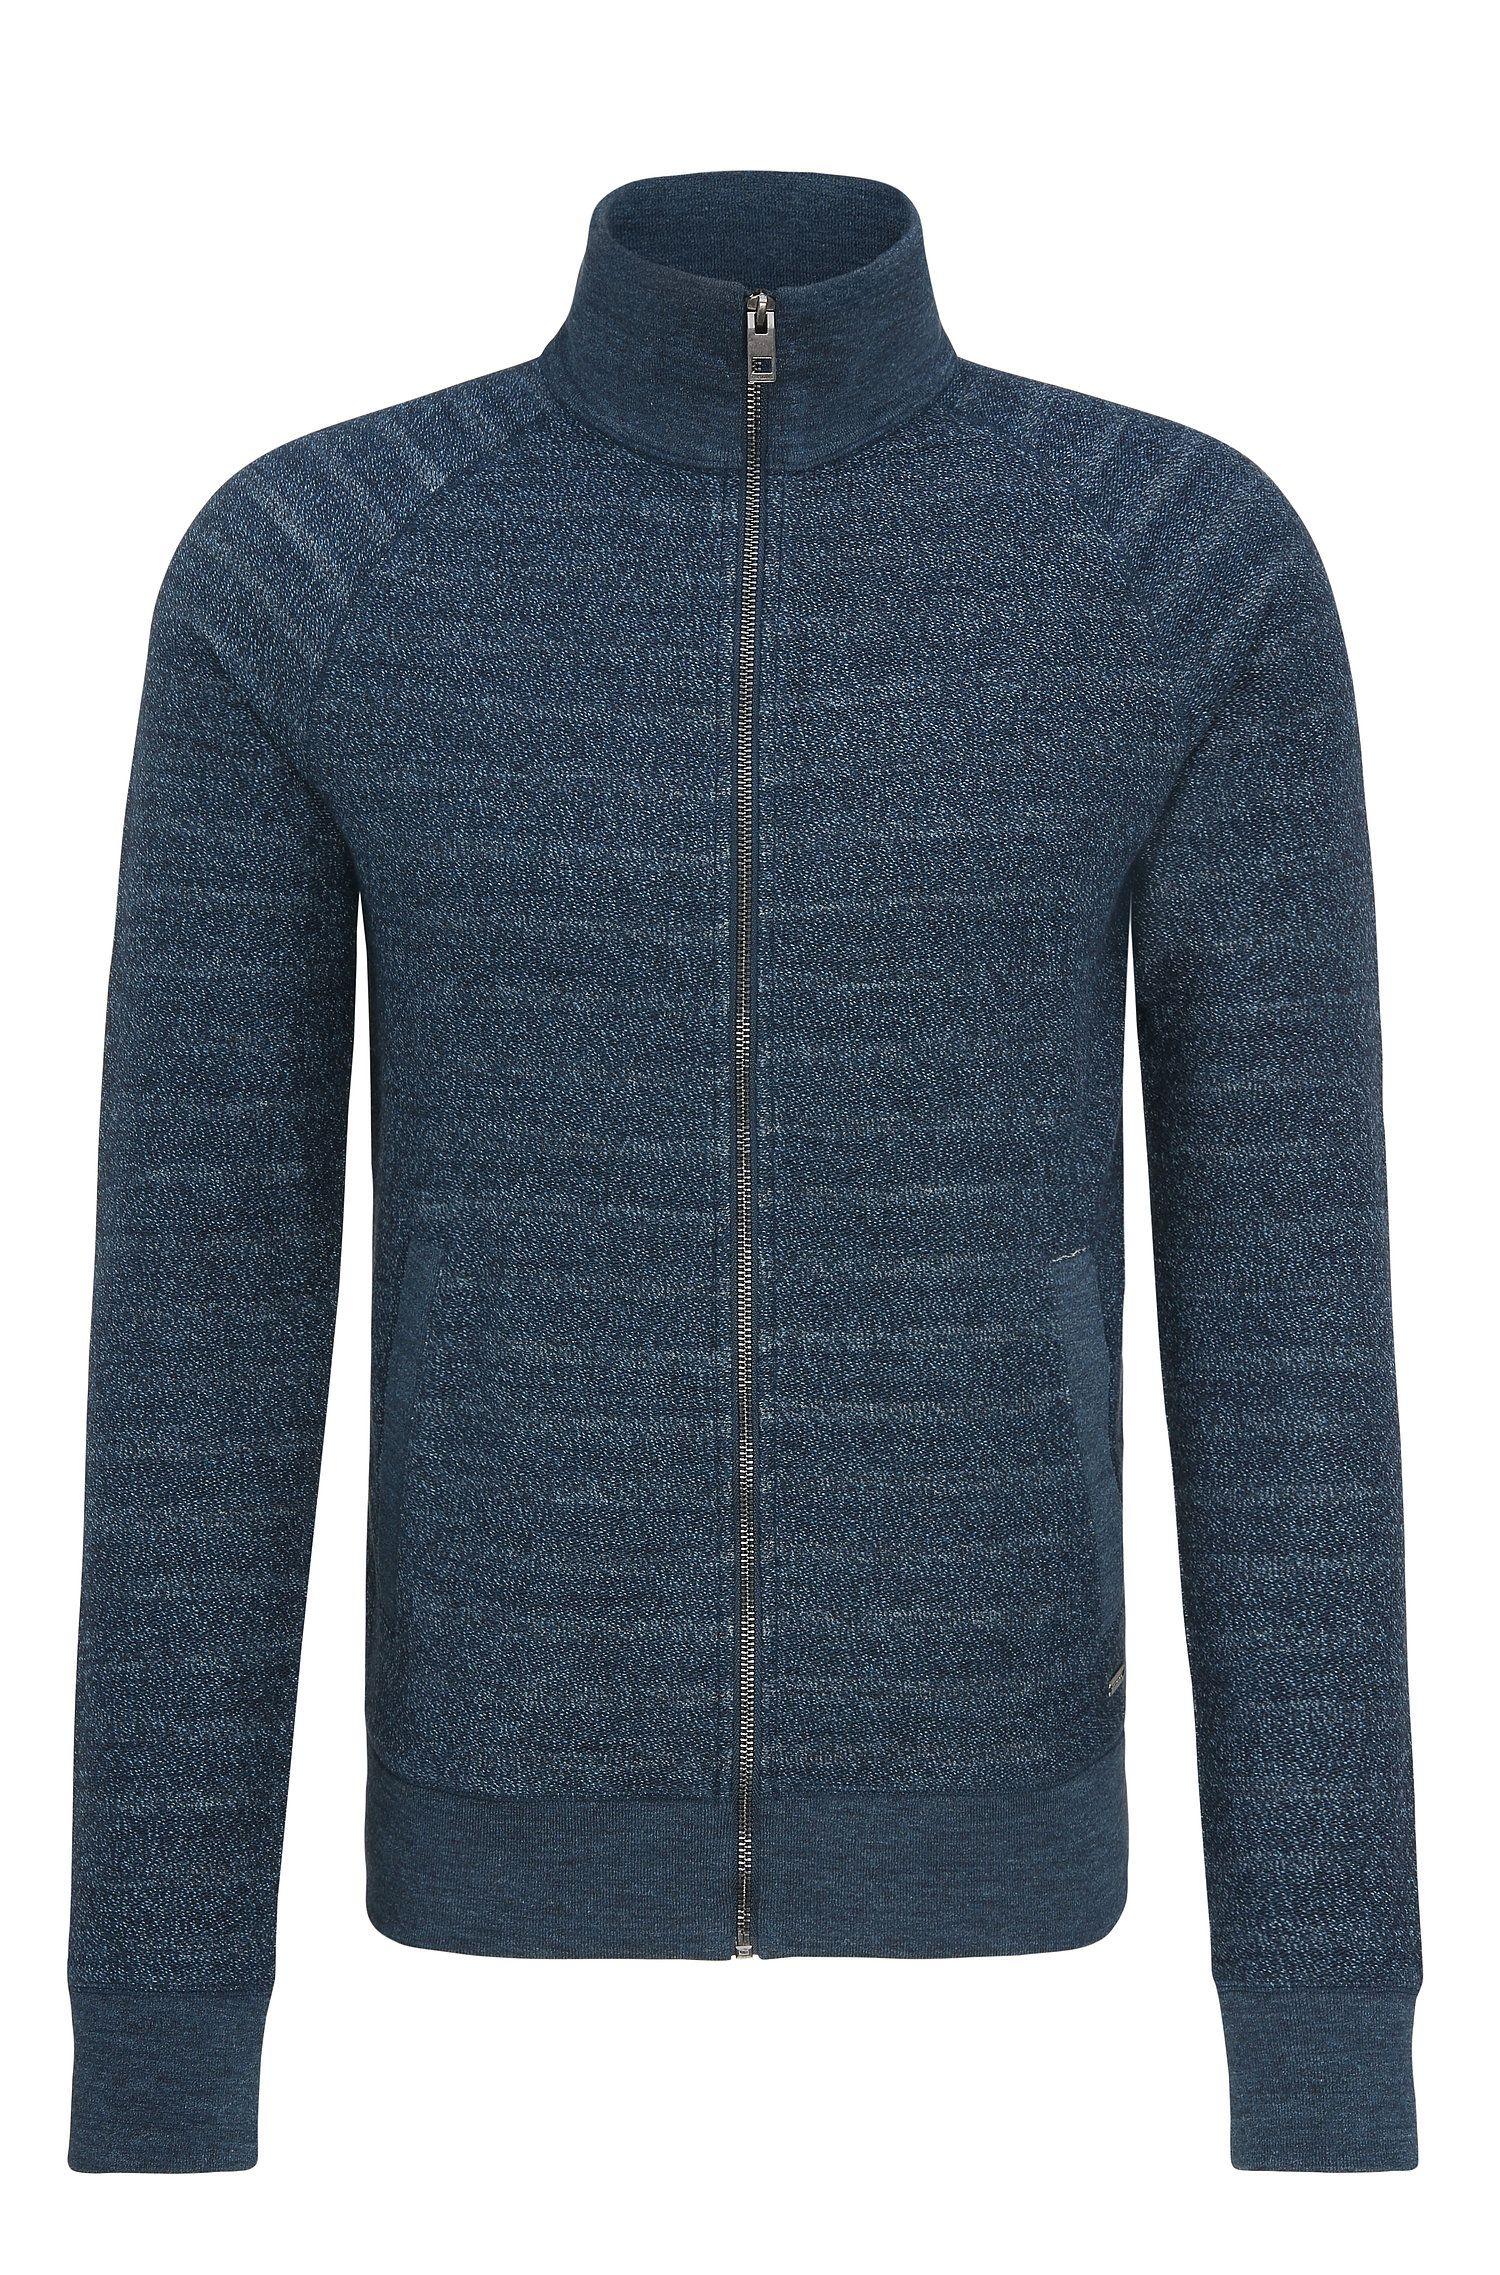 'Zlate'   Melange Cotton Full-Zip Sweater